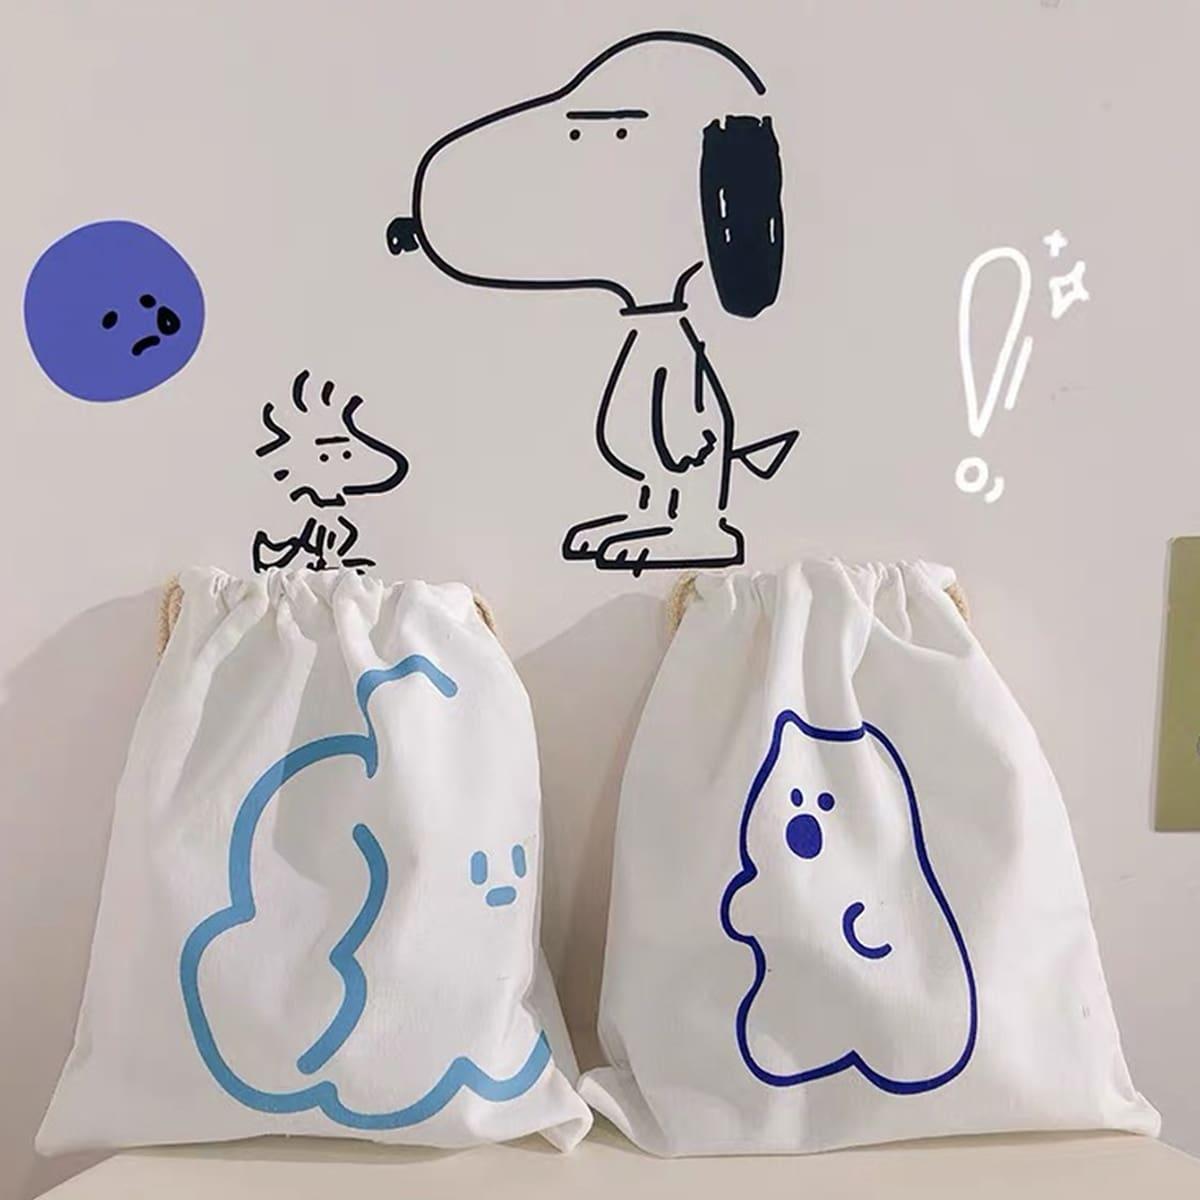 1pc Cartoon Print Drawstring Storage Bag